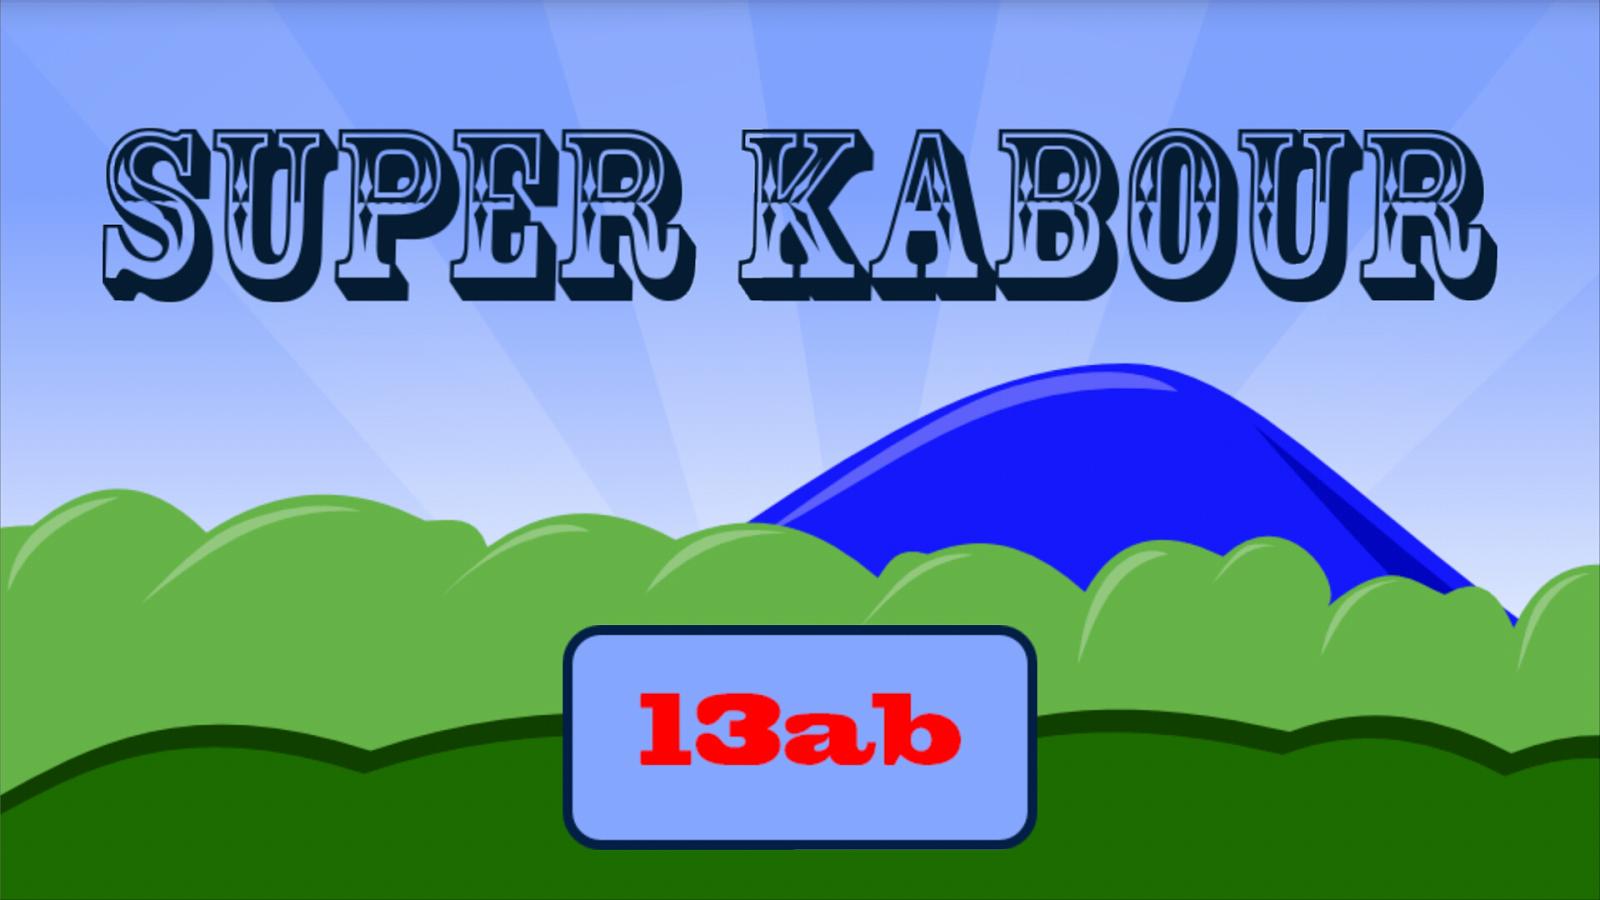 ���� ��������� � ������� super kabour - ���� ����